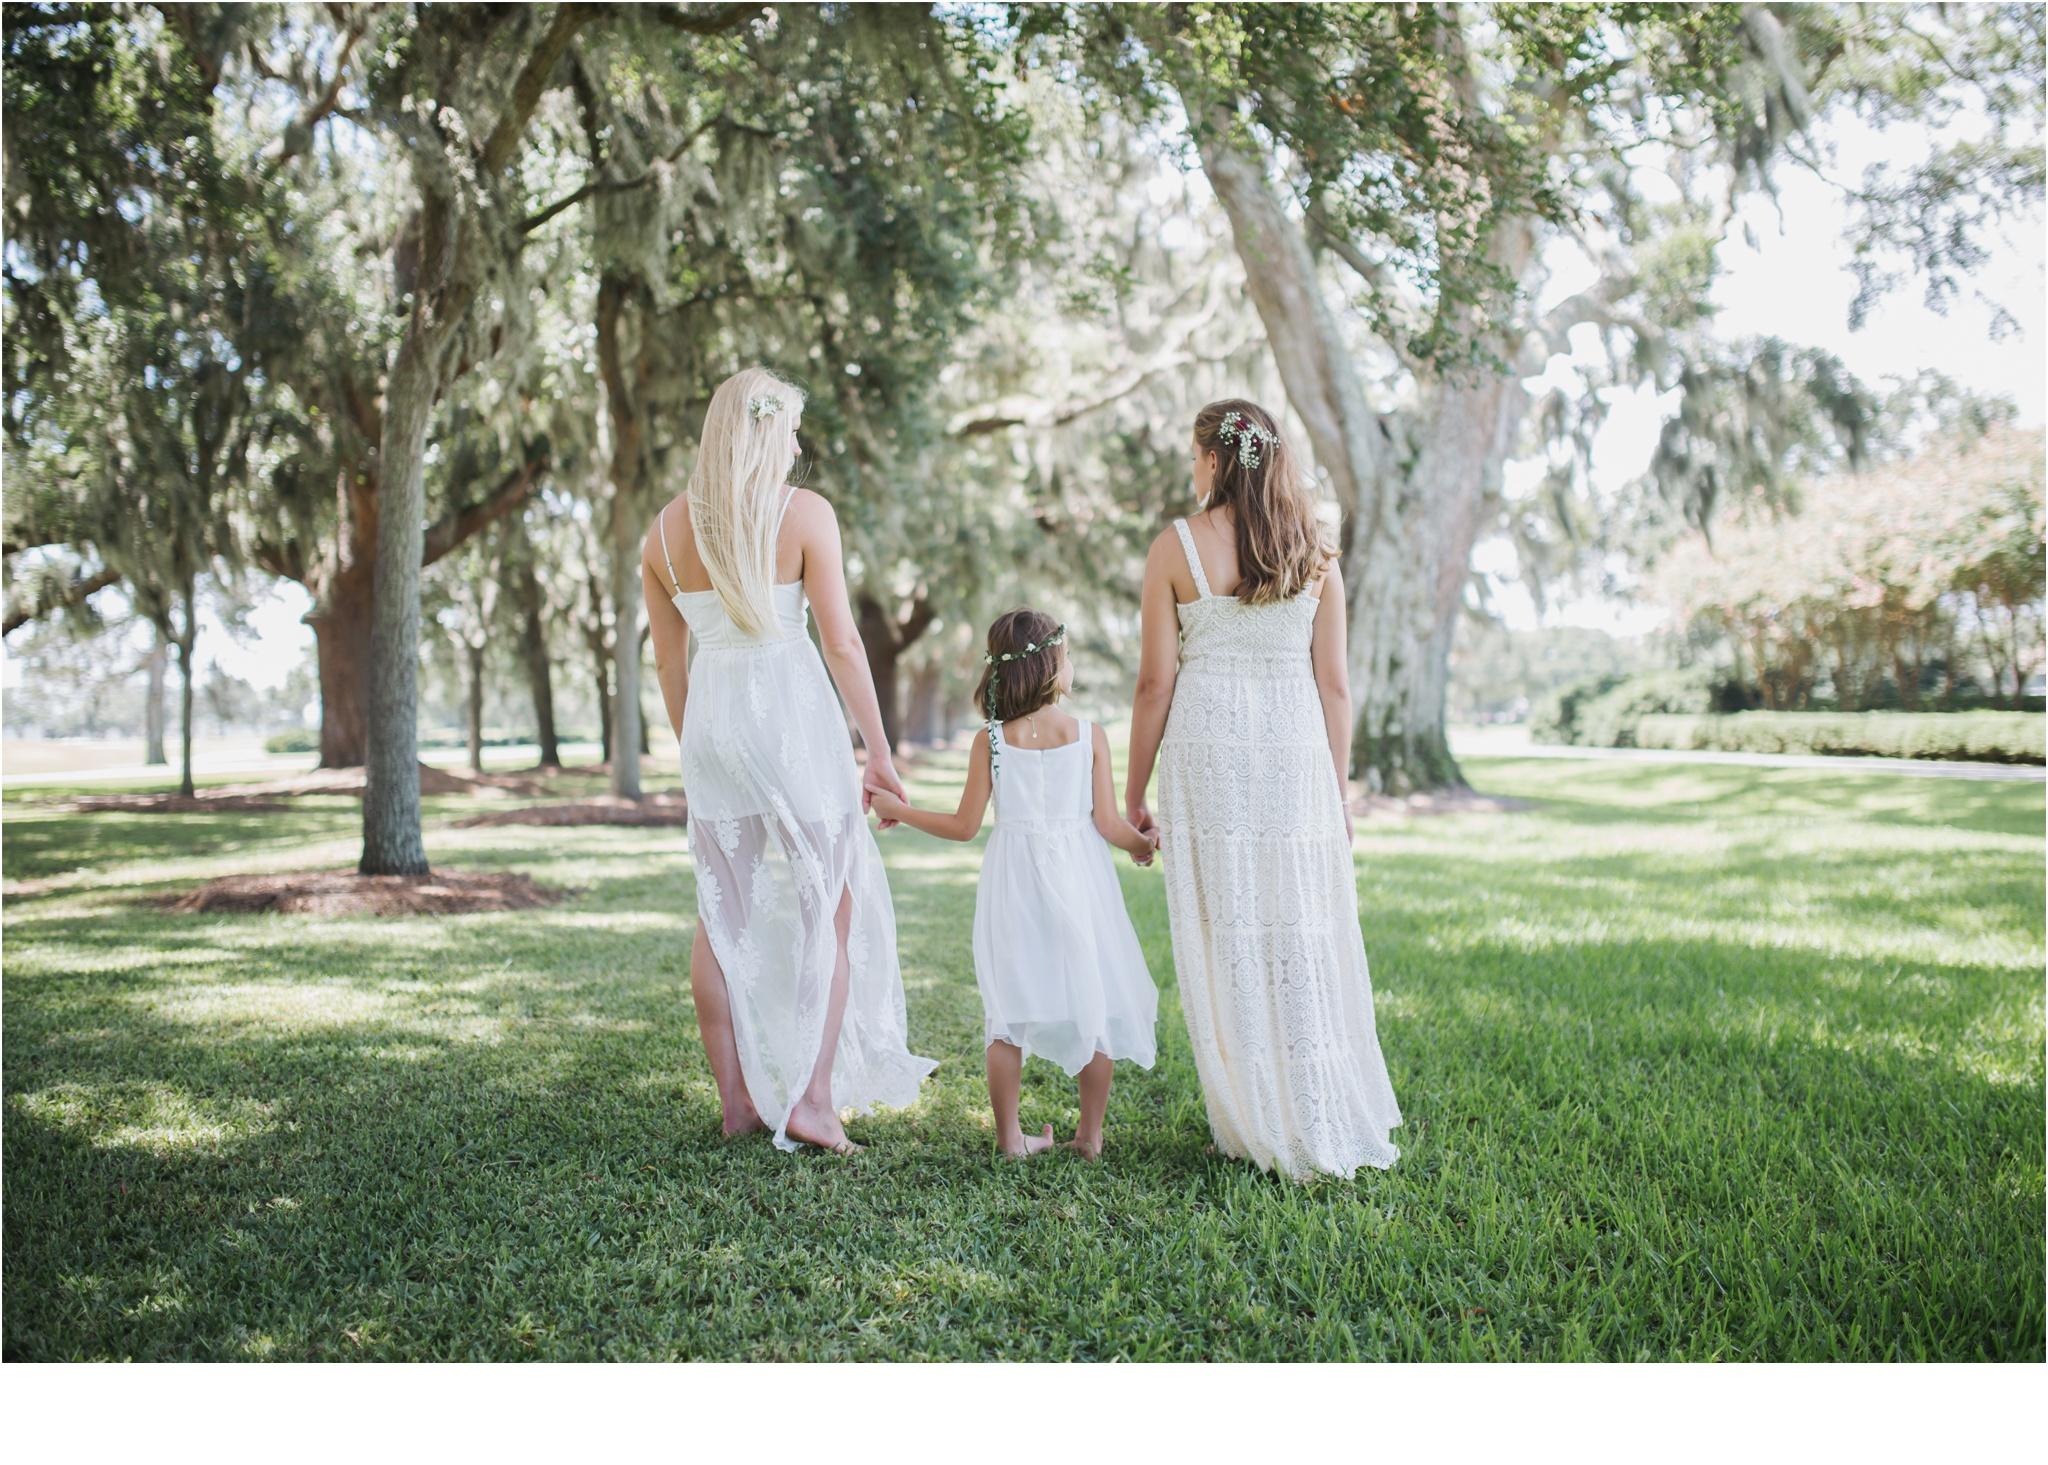 Rainey_Gregg_Photography_St._Simons_Island_Georgia_California_Wedding_Portrait_Photography_1104.jpg